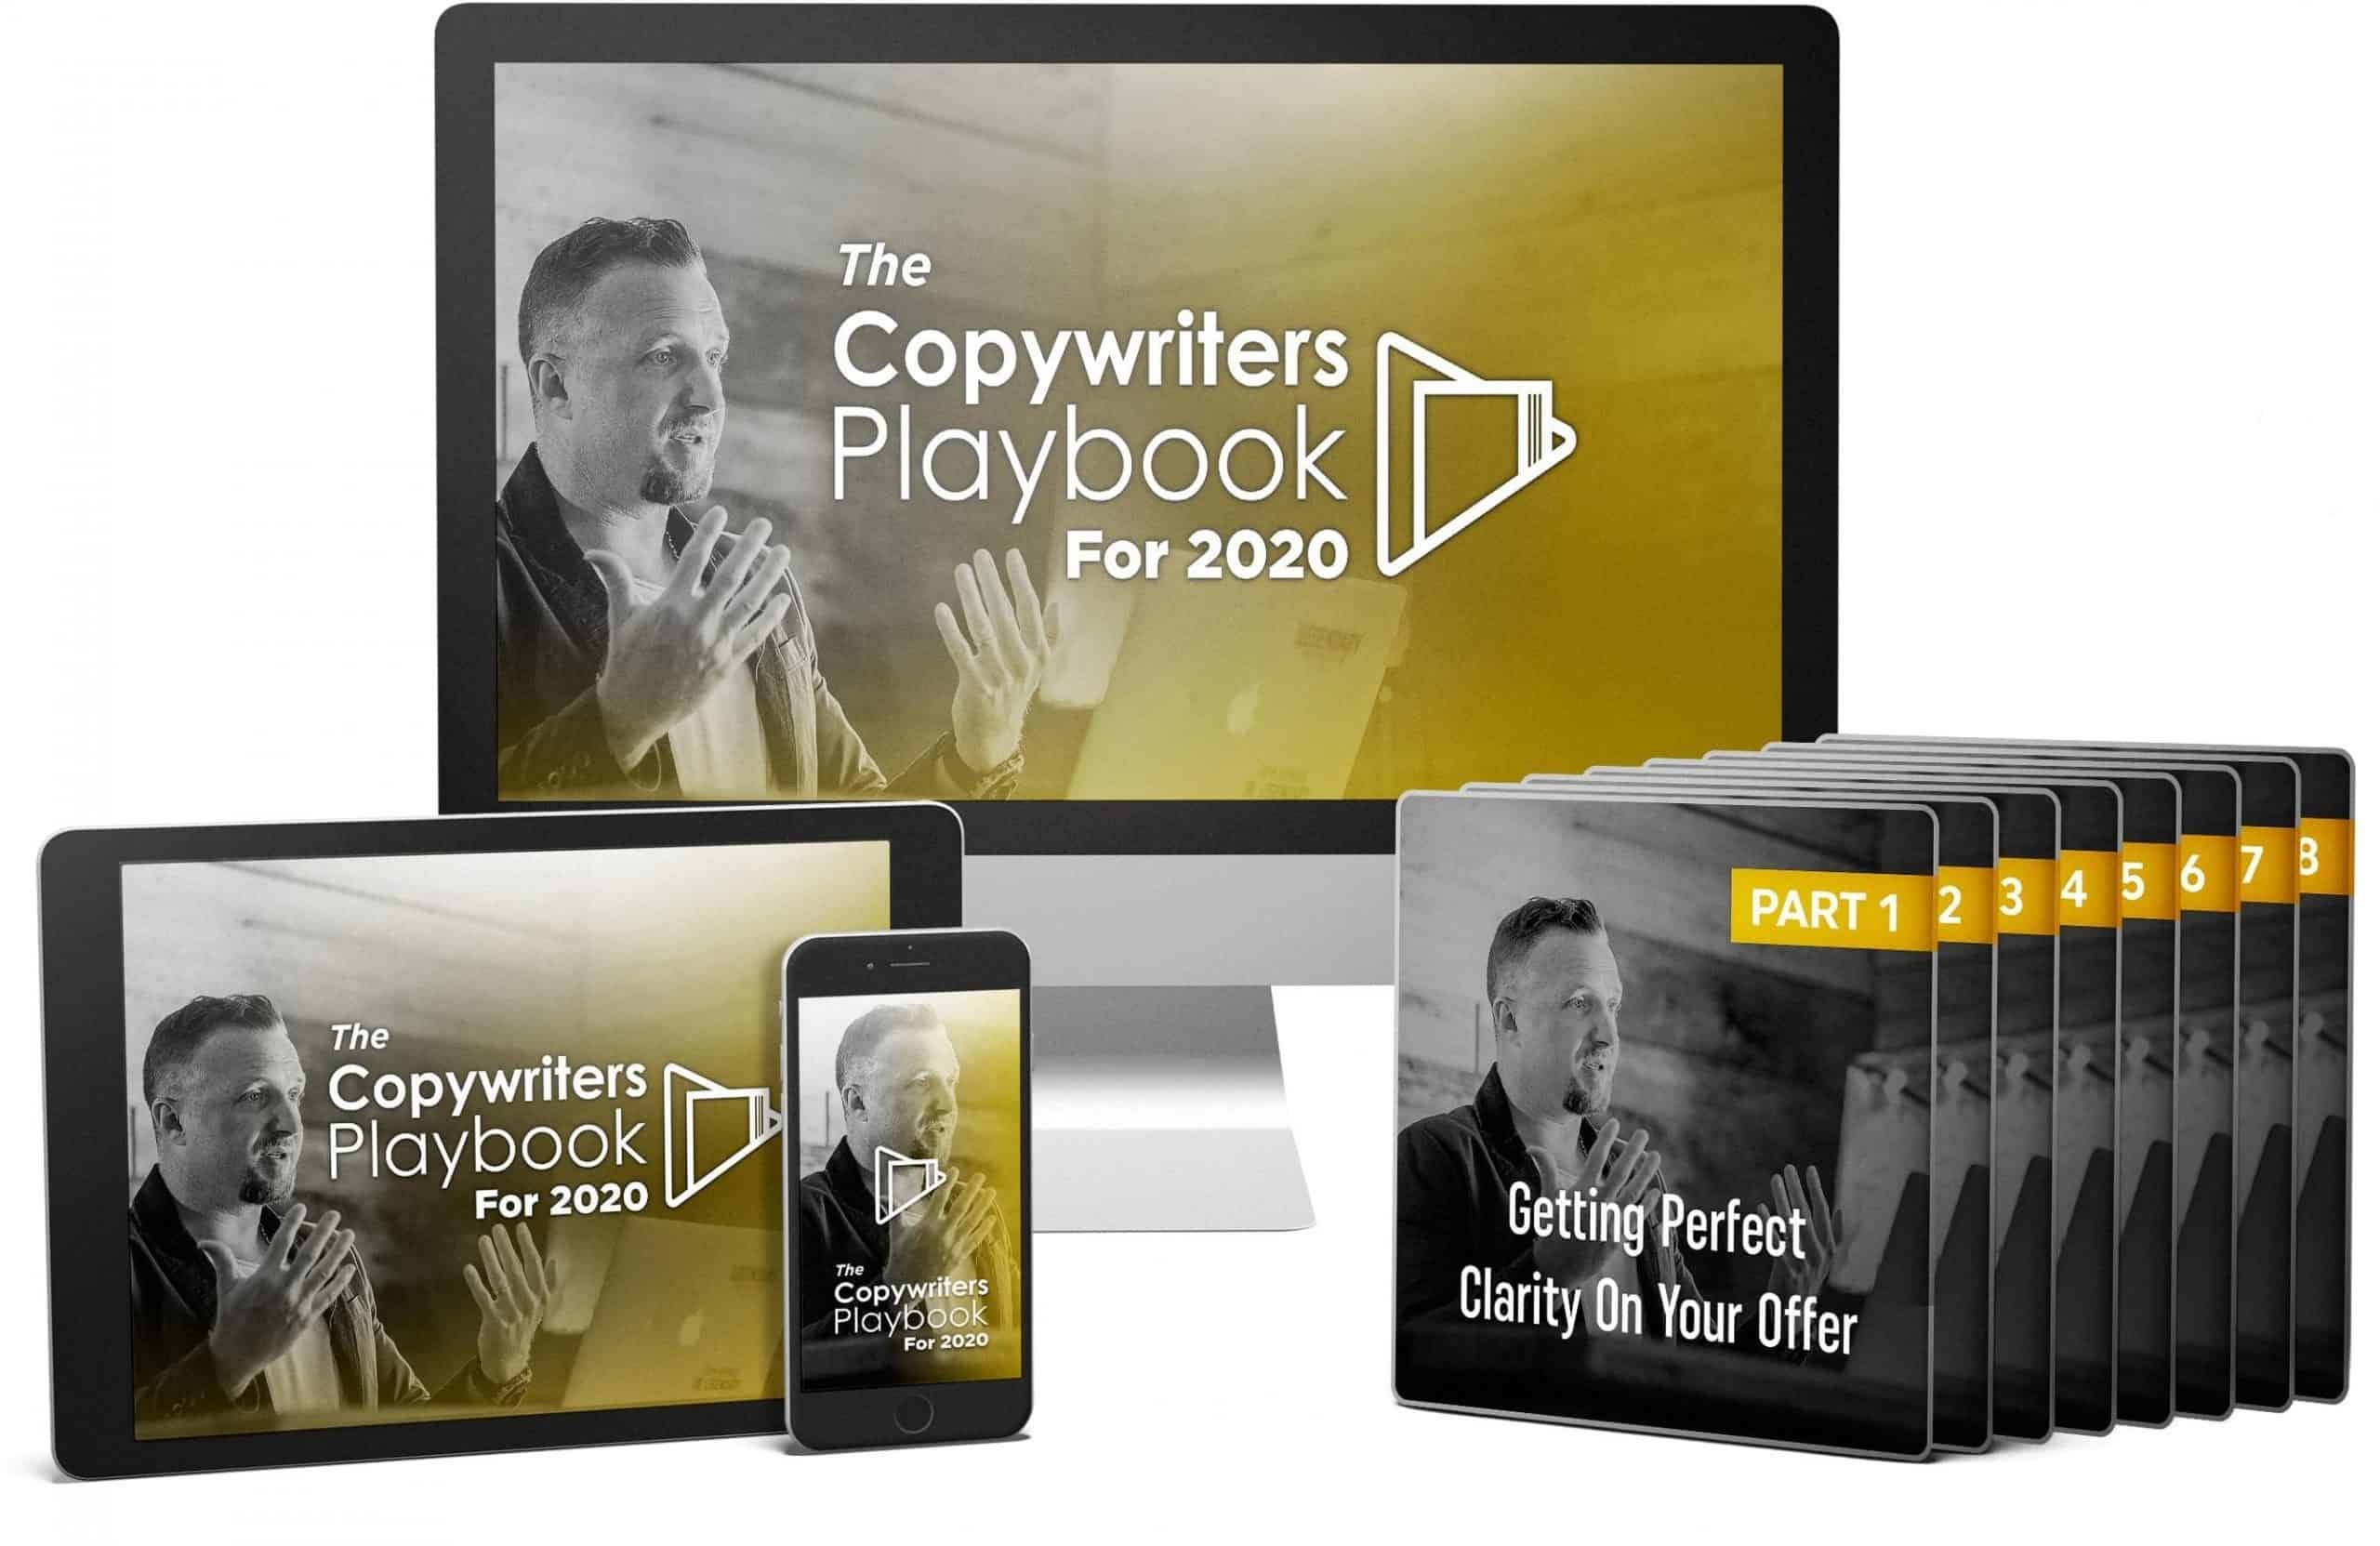 The Copywriters Playbook [Copywriting ebook download]2_LI